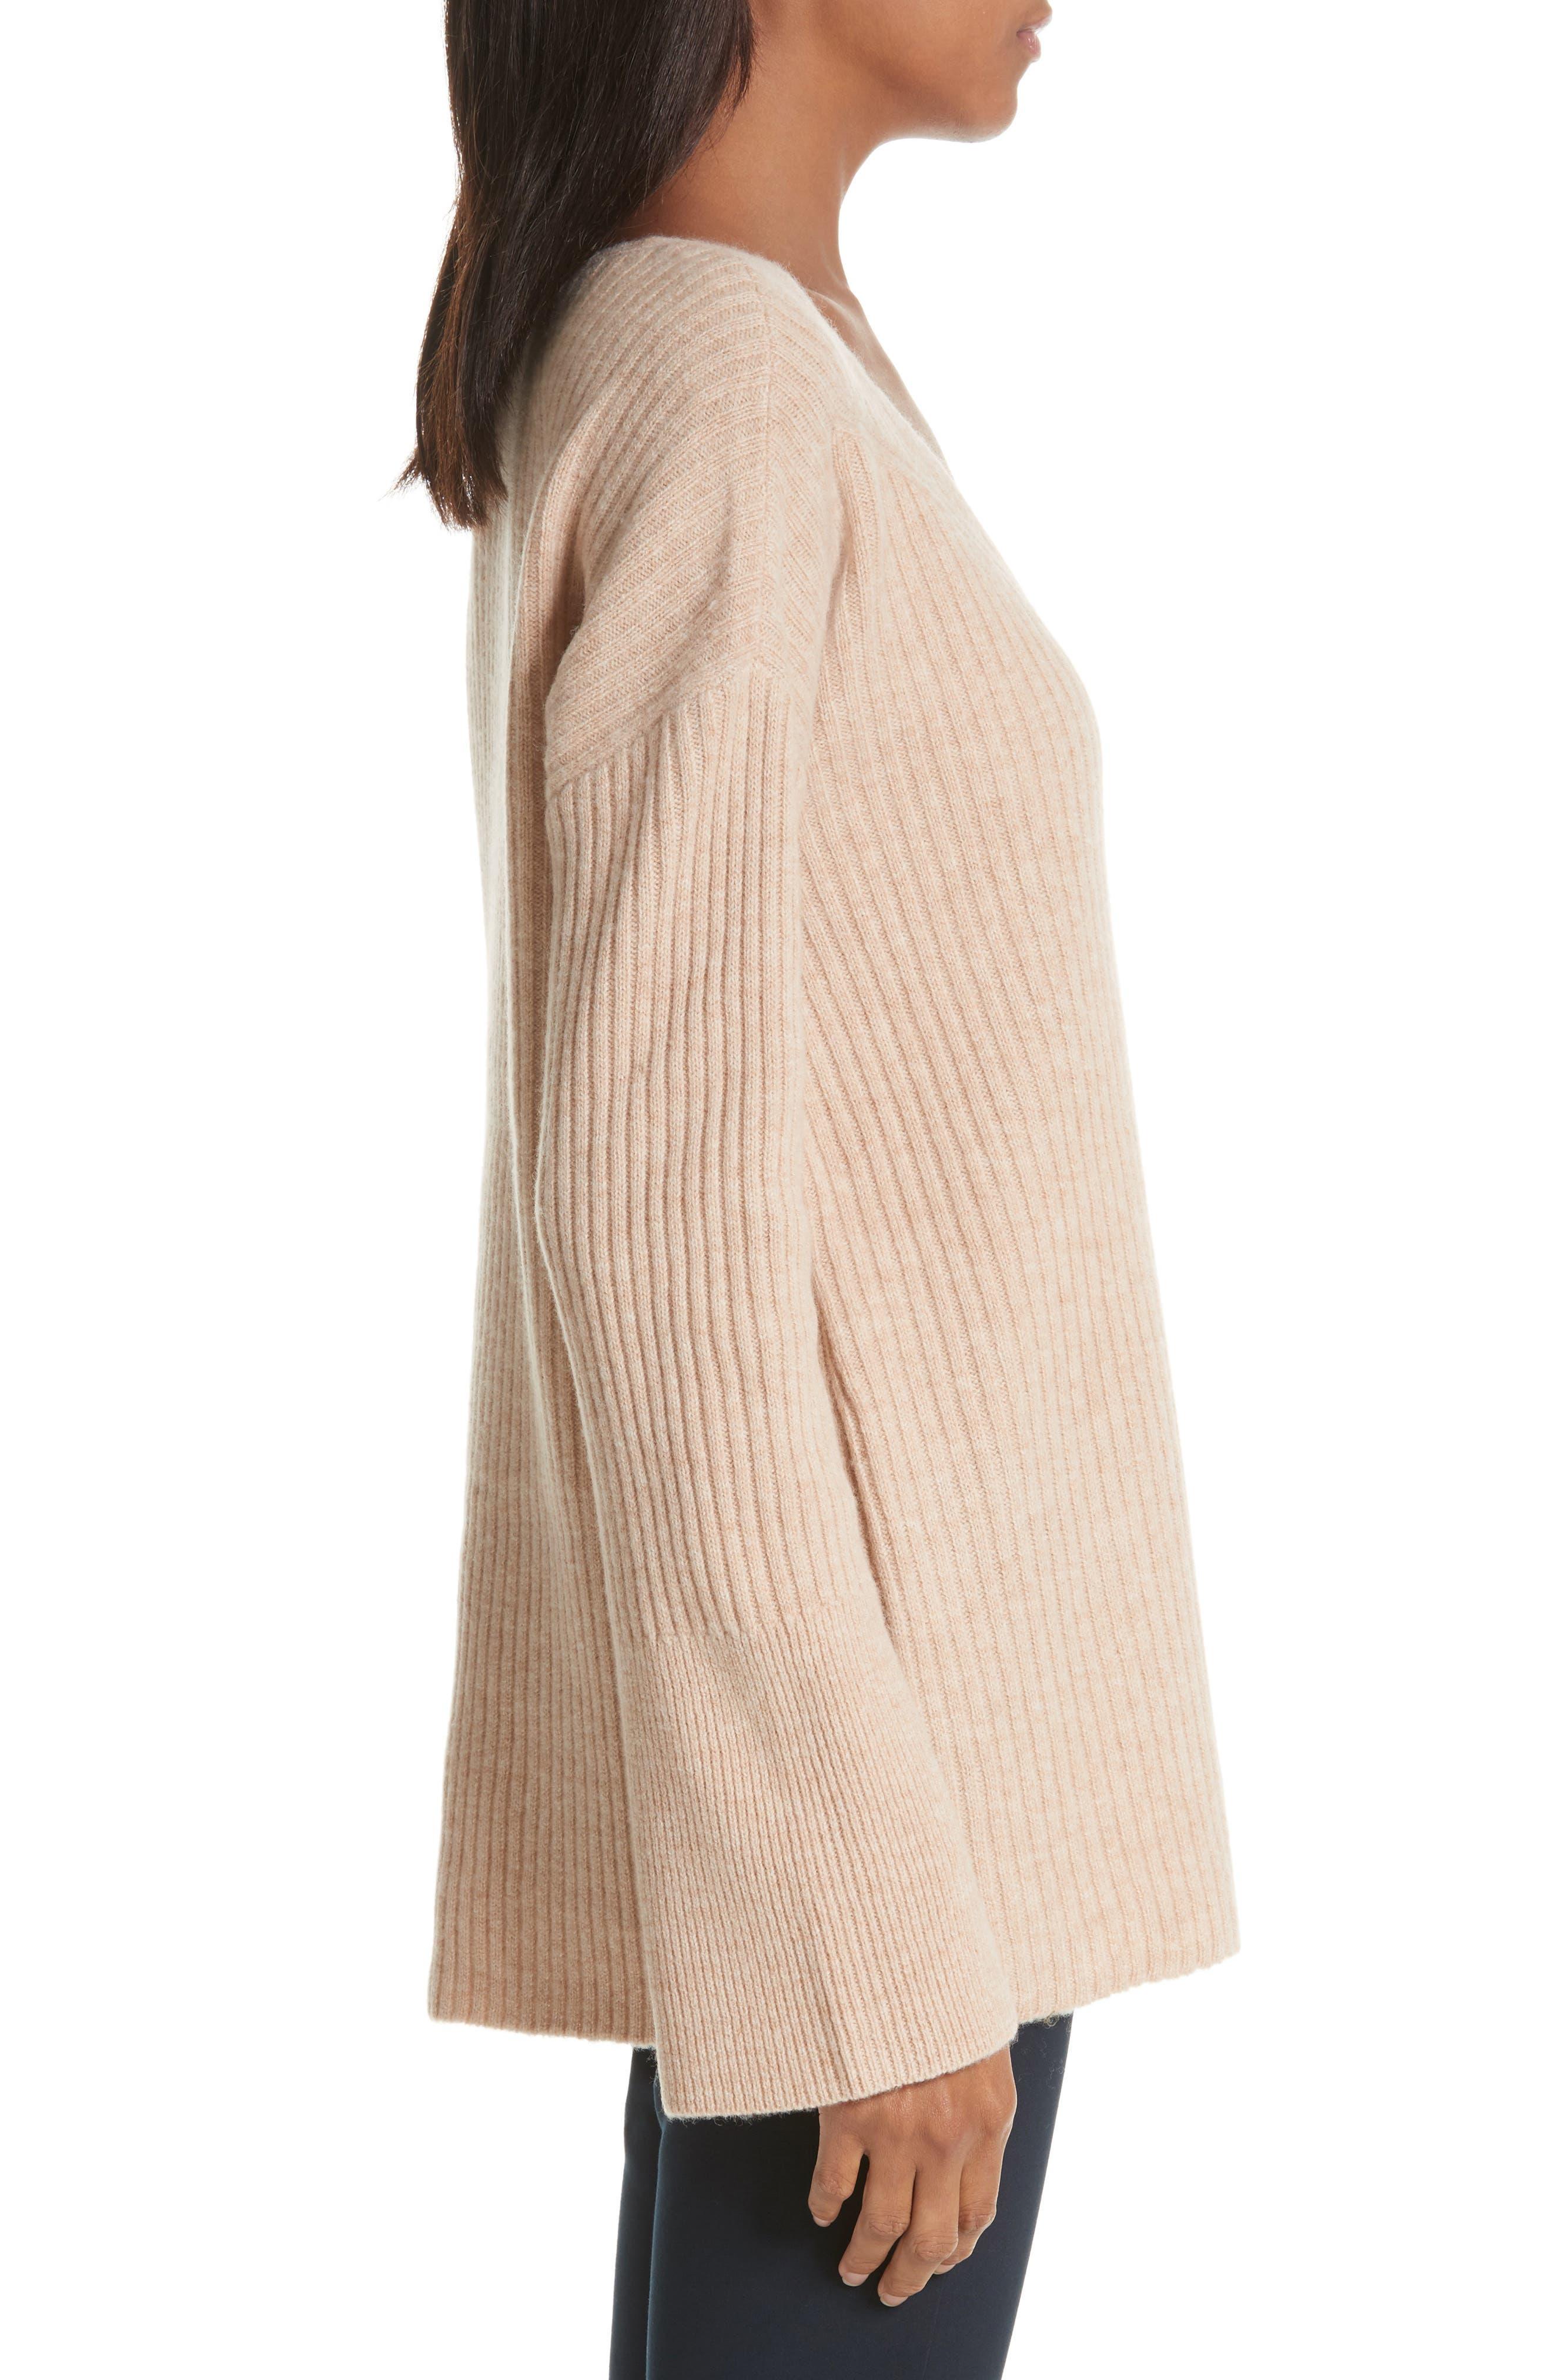 Mitchell Merino Wool Sweater,                             Alternate thumbnail 3, color,                             Oat